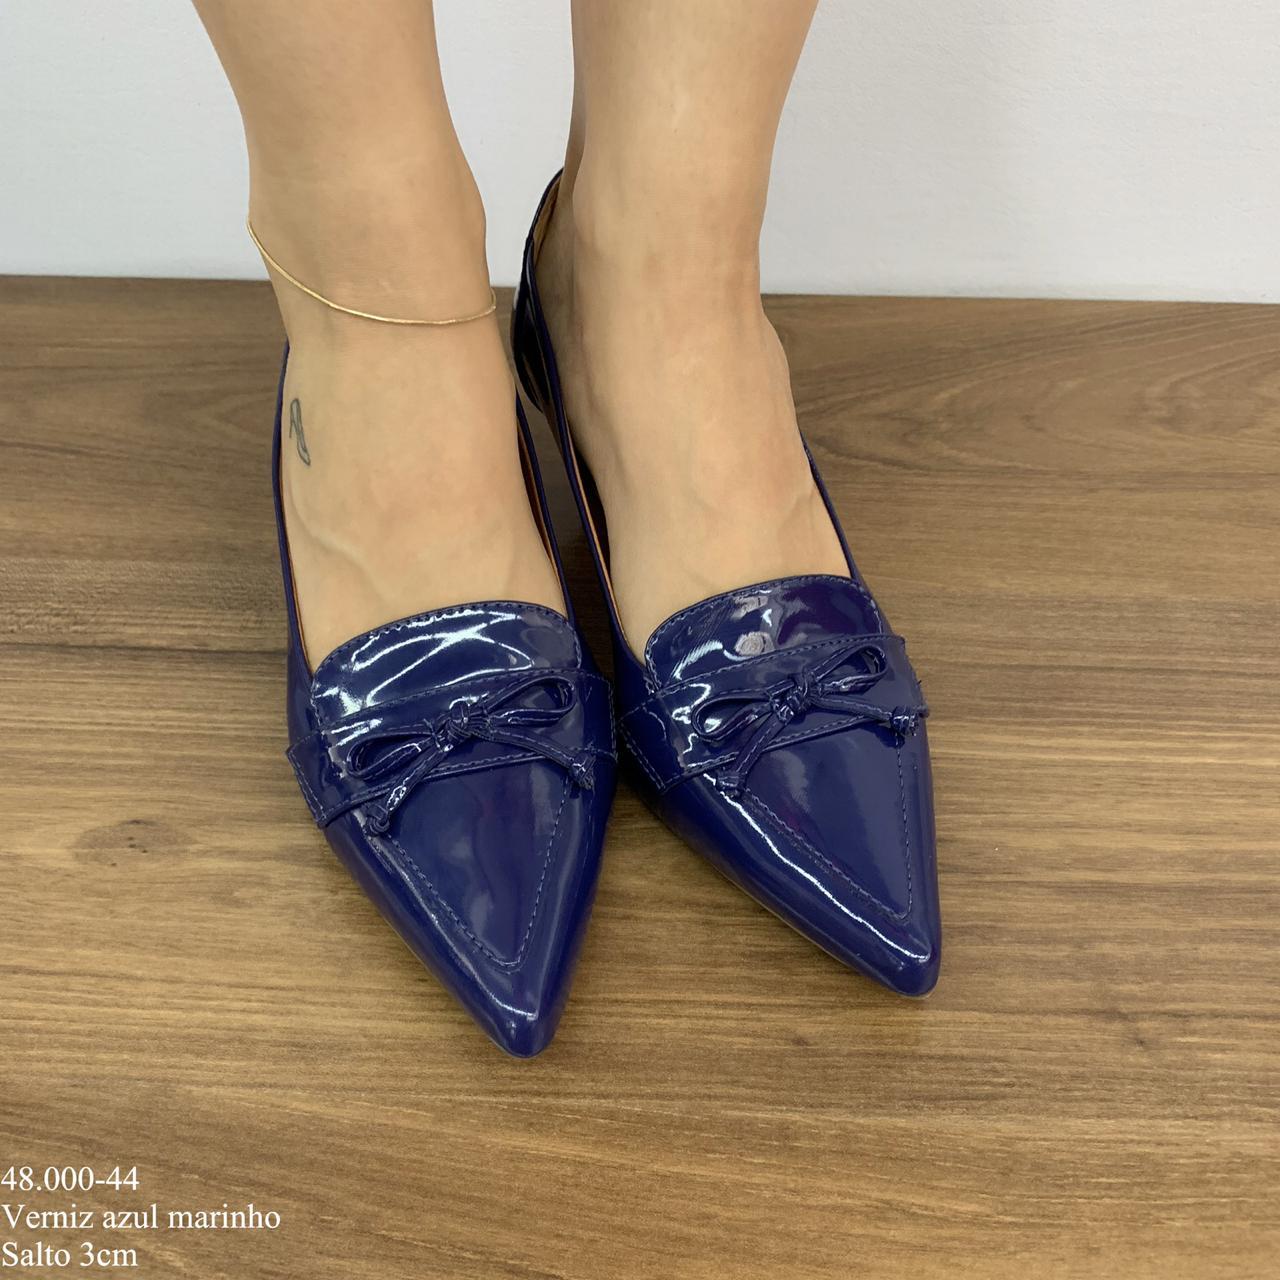 Sapato Social Scarpin Azul Marinho   D-48.000-44